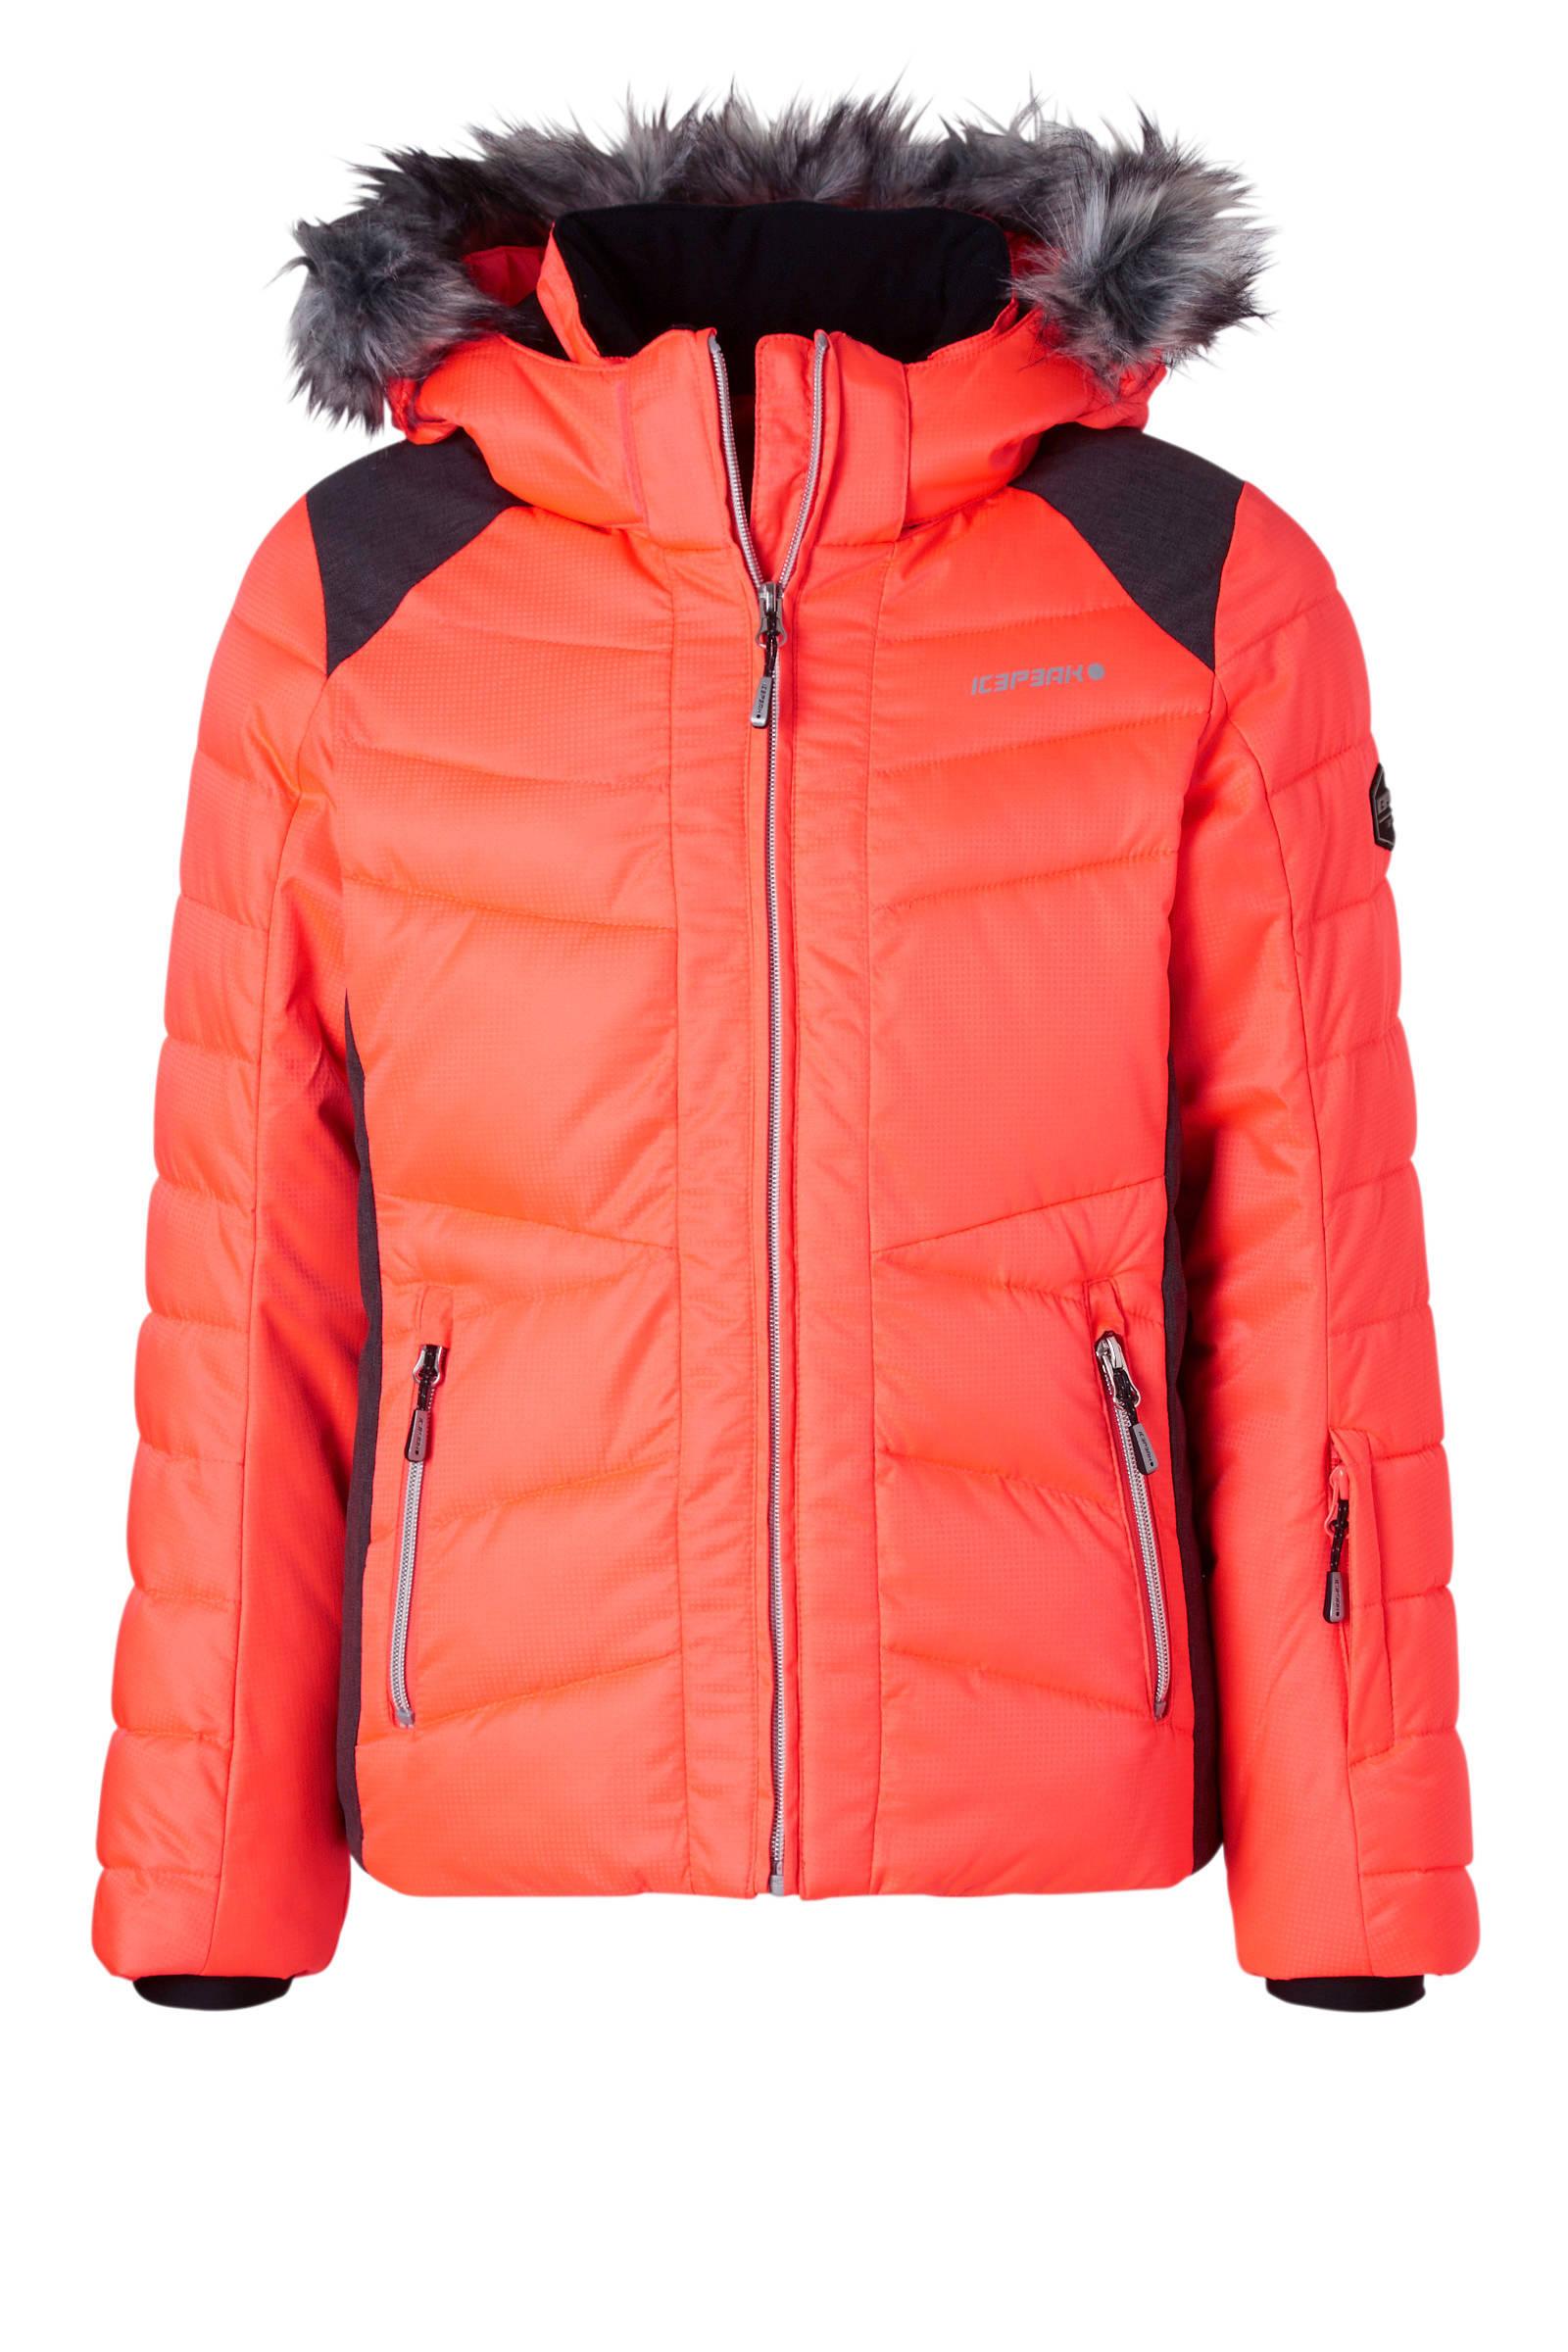 22f6b34c3d5 icepeak-ski-jack-hara-jr-meisjes-oranje-6413680159649.jpg